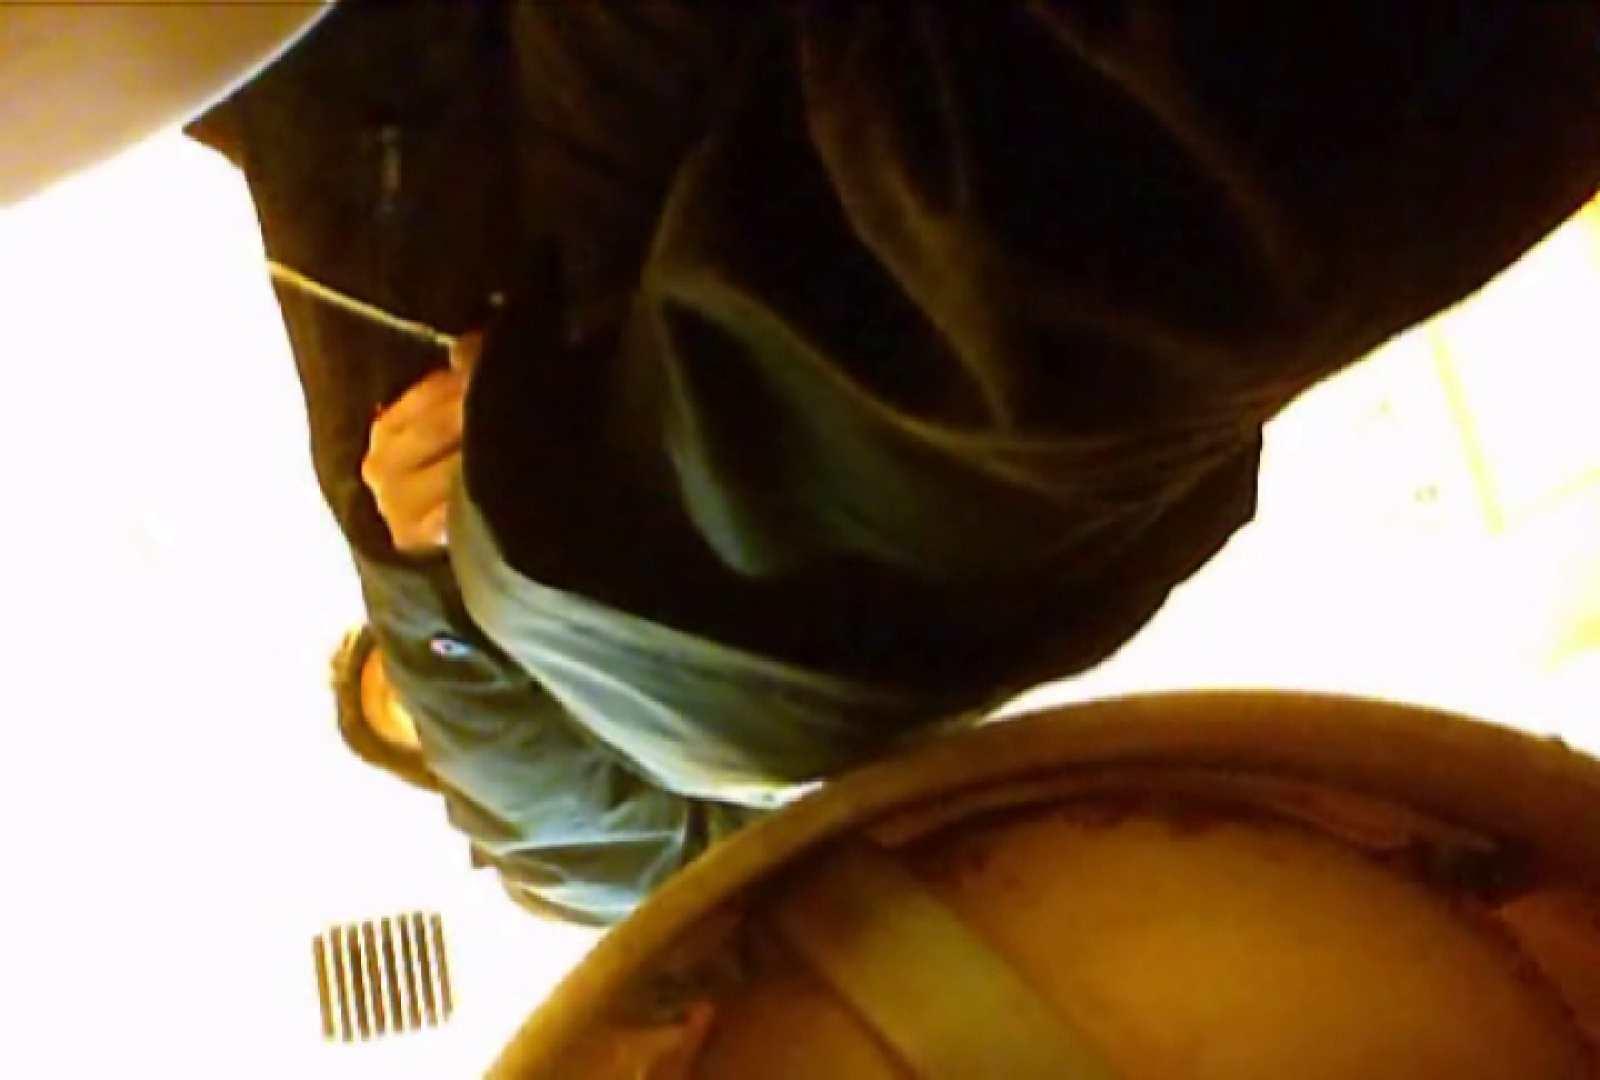 SEASON 2ND!掴み取りさんの洗面所覗き!in新幹線!VOL.02 スーツボーイズ | ノンケボーイズ  82pic 80